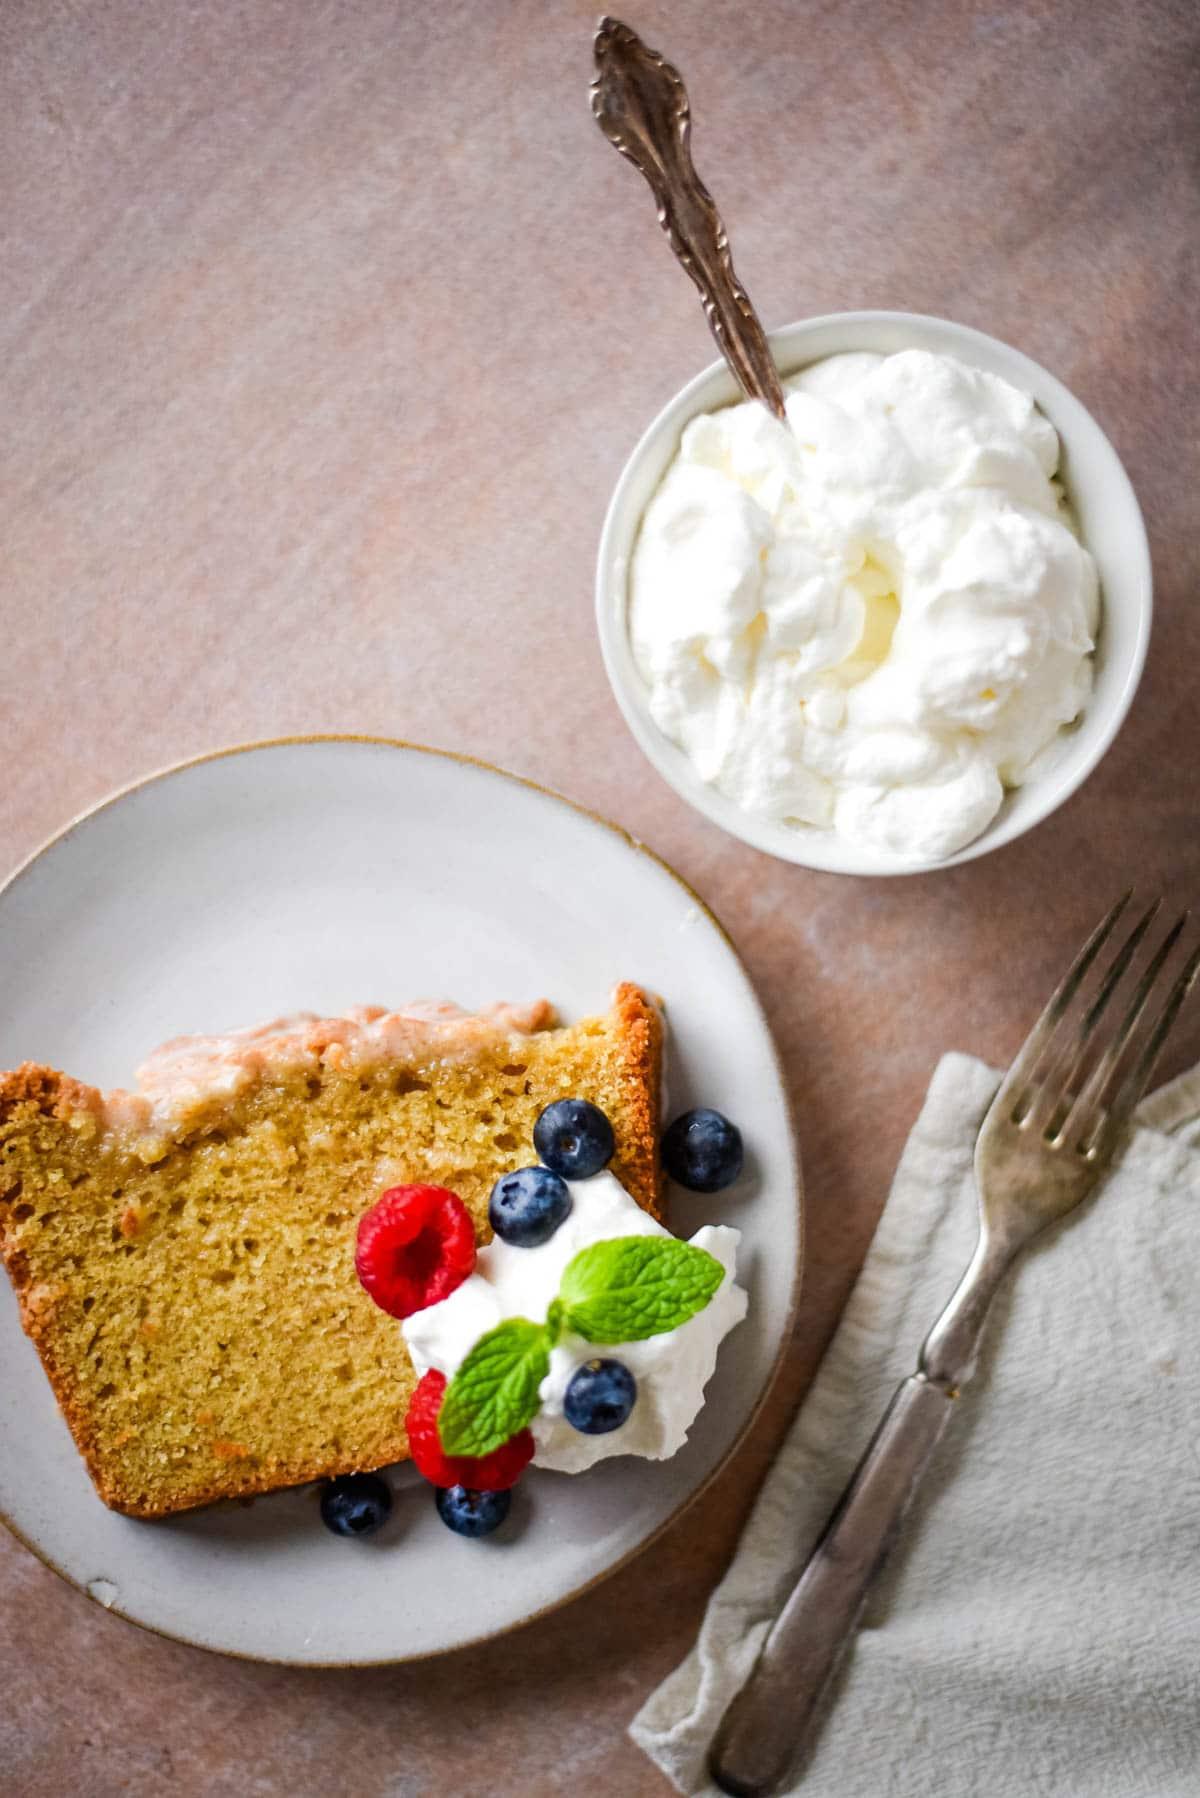 slice of pound cake next to whipped cream